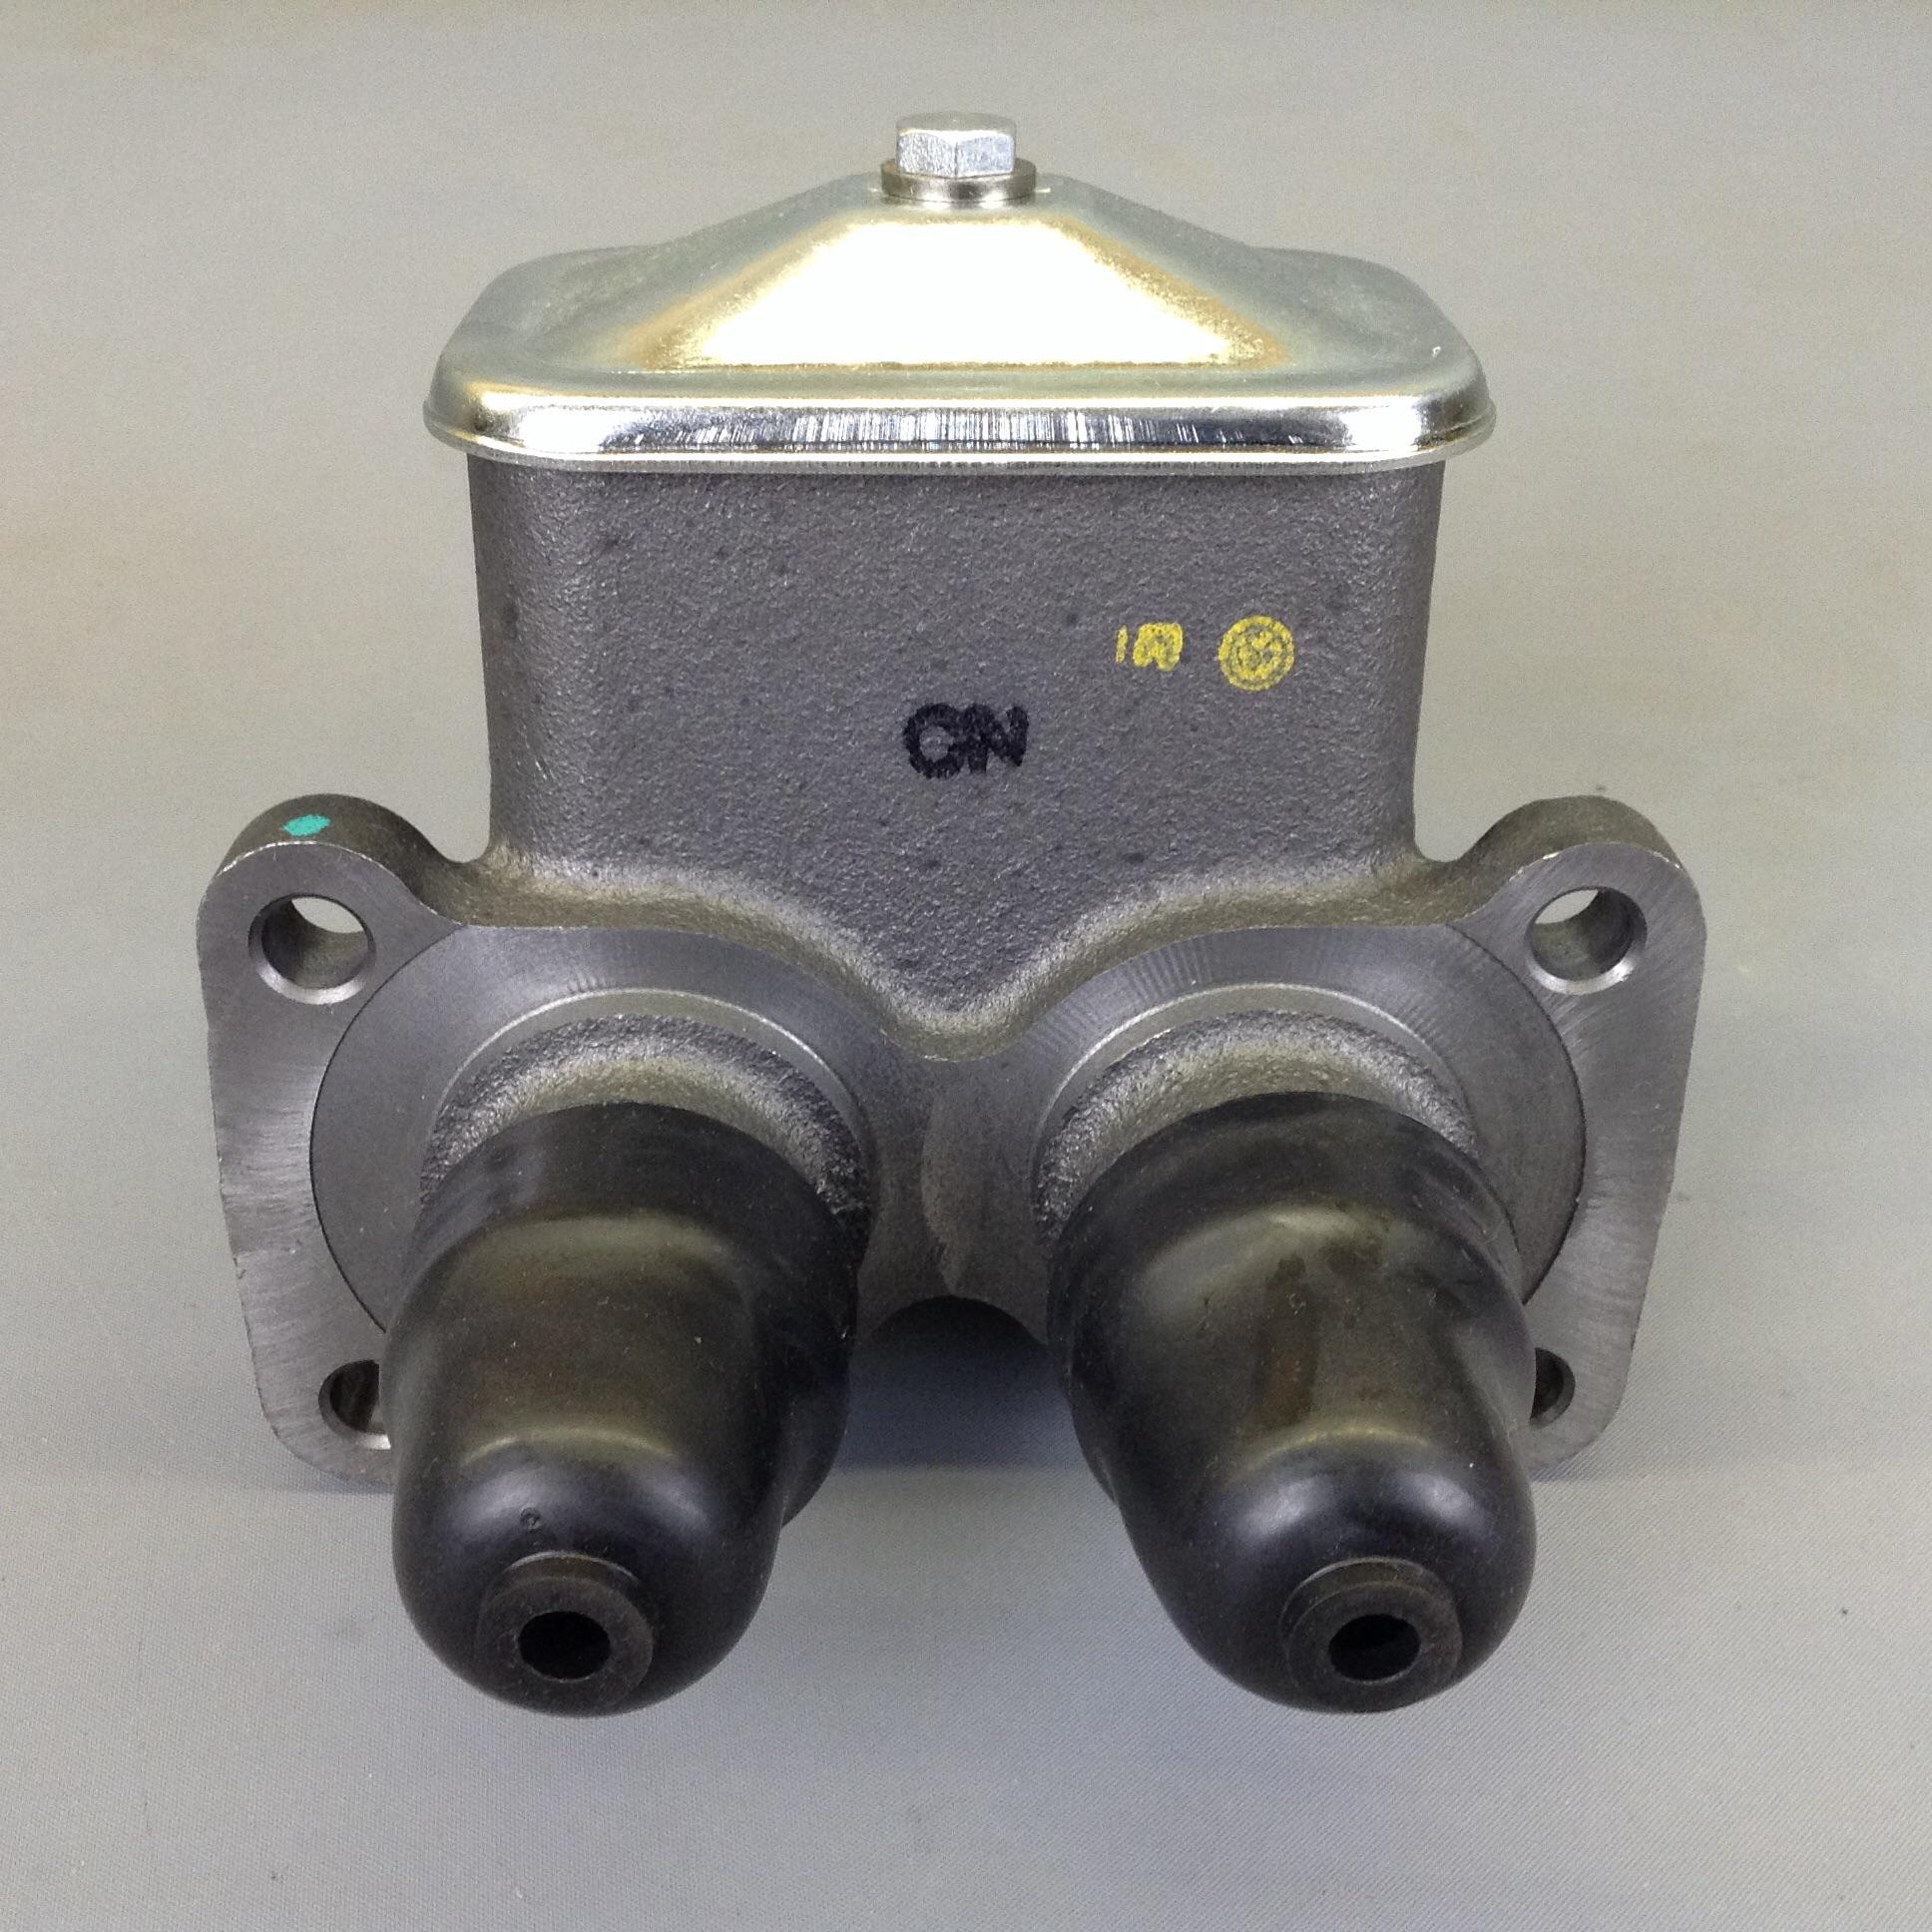 For 1971-1973 International Scout II Brake Master Cylinder Cardone 98668MQ 1972